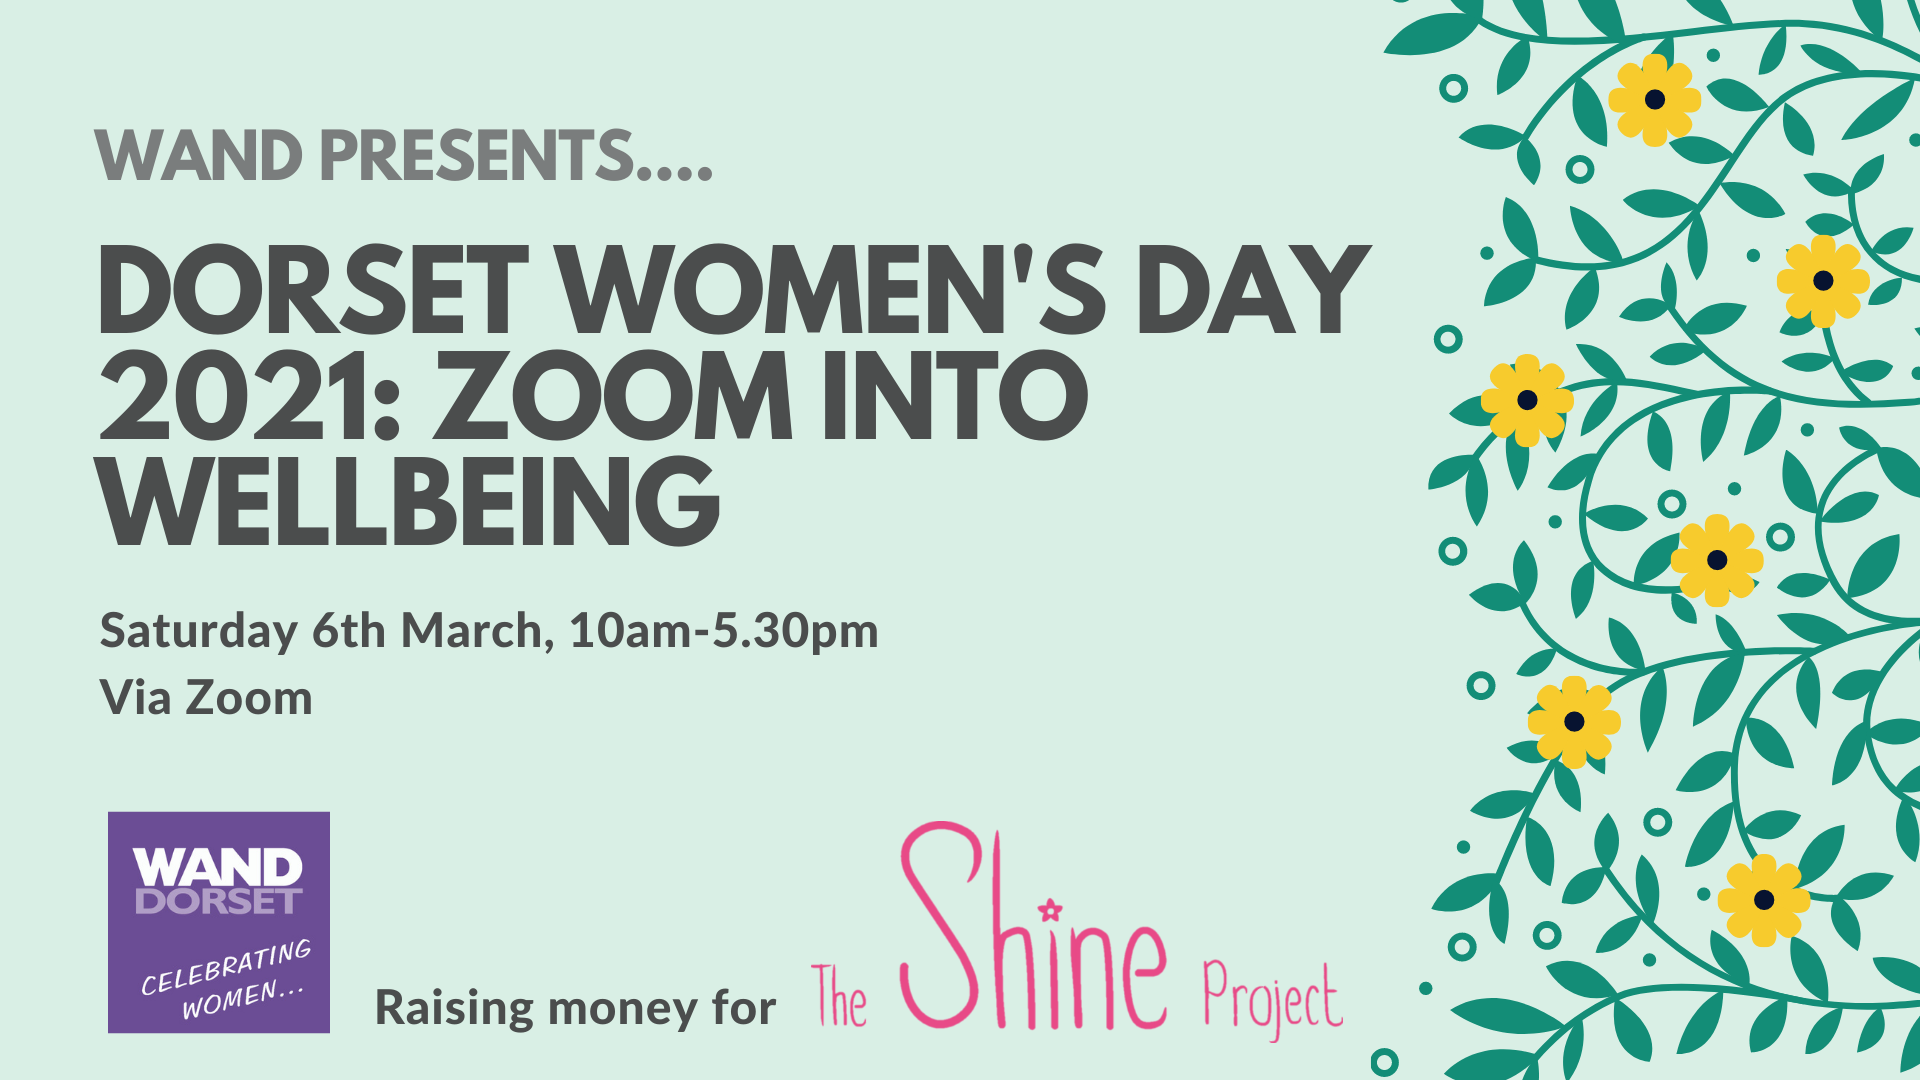 Dorset Women's Day 2021: Zoom into Wellbeing